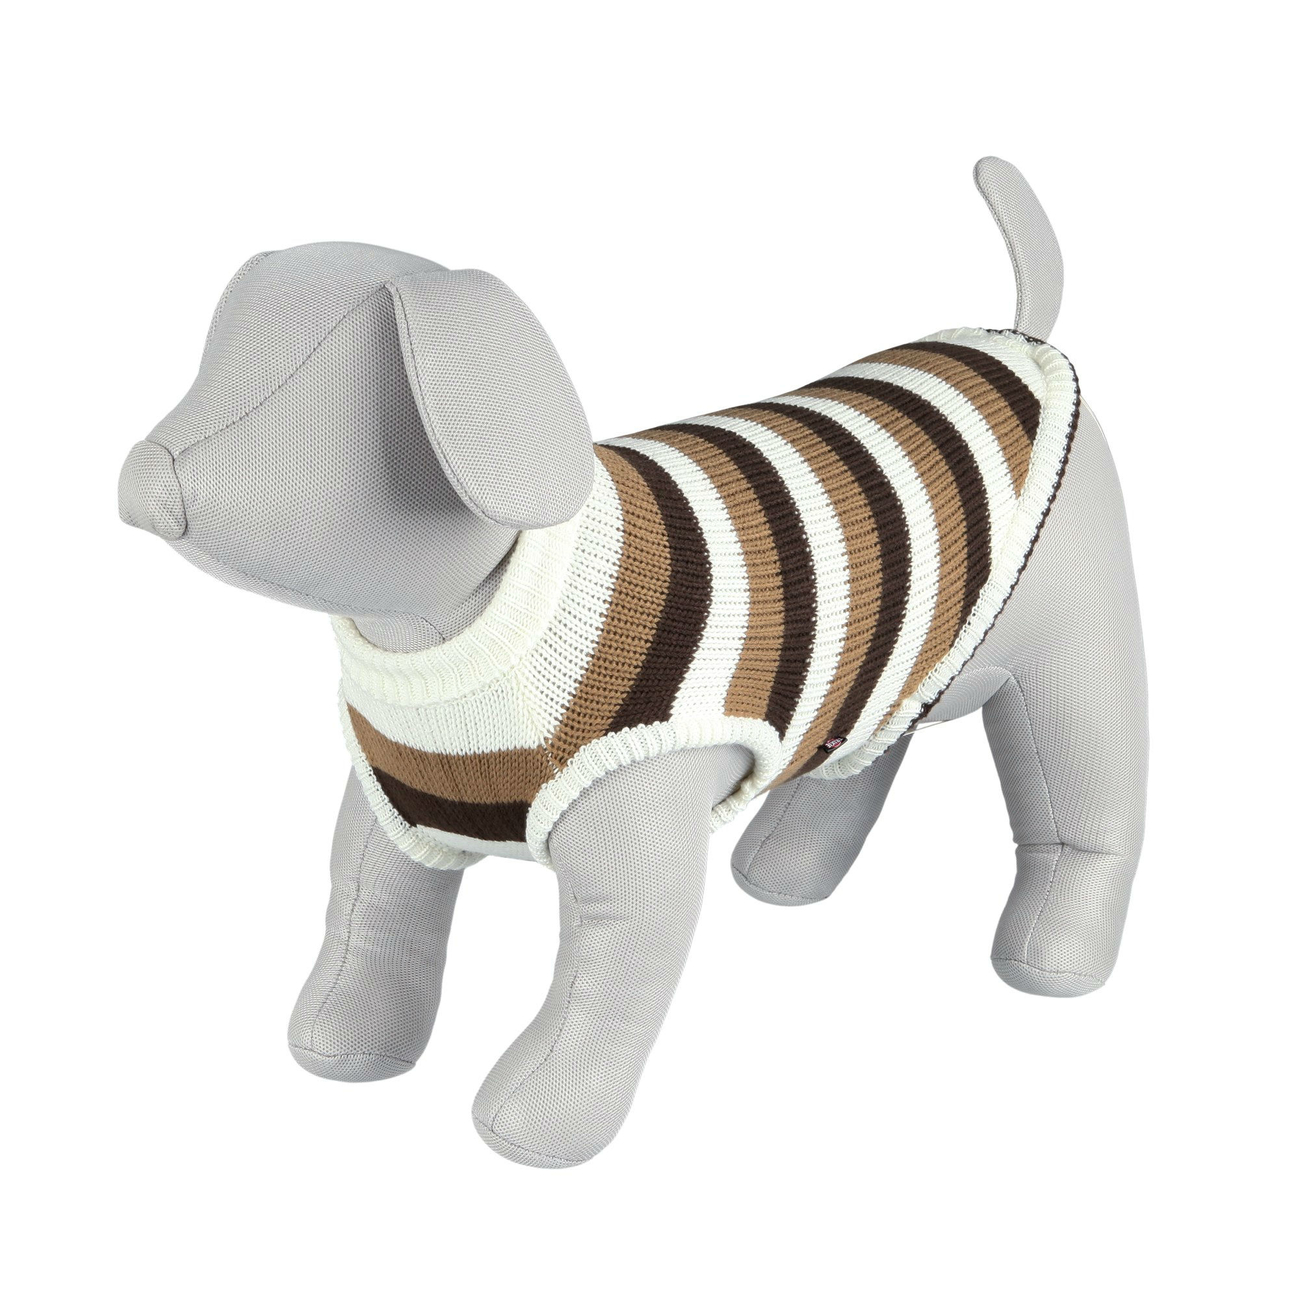 Trixie Hundepullover Hamilton 30540, Bild 2